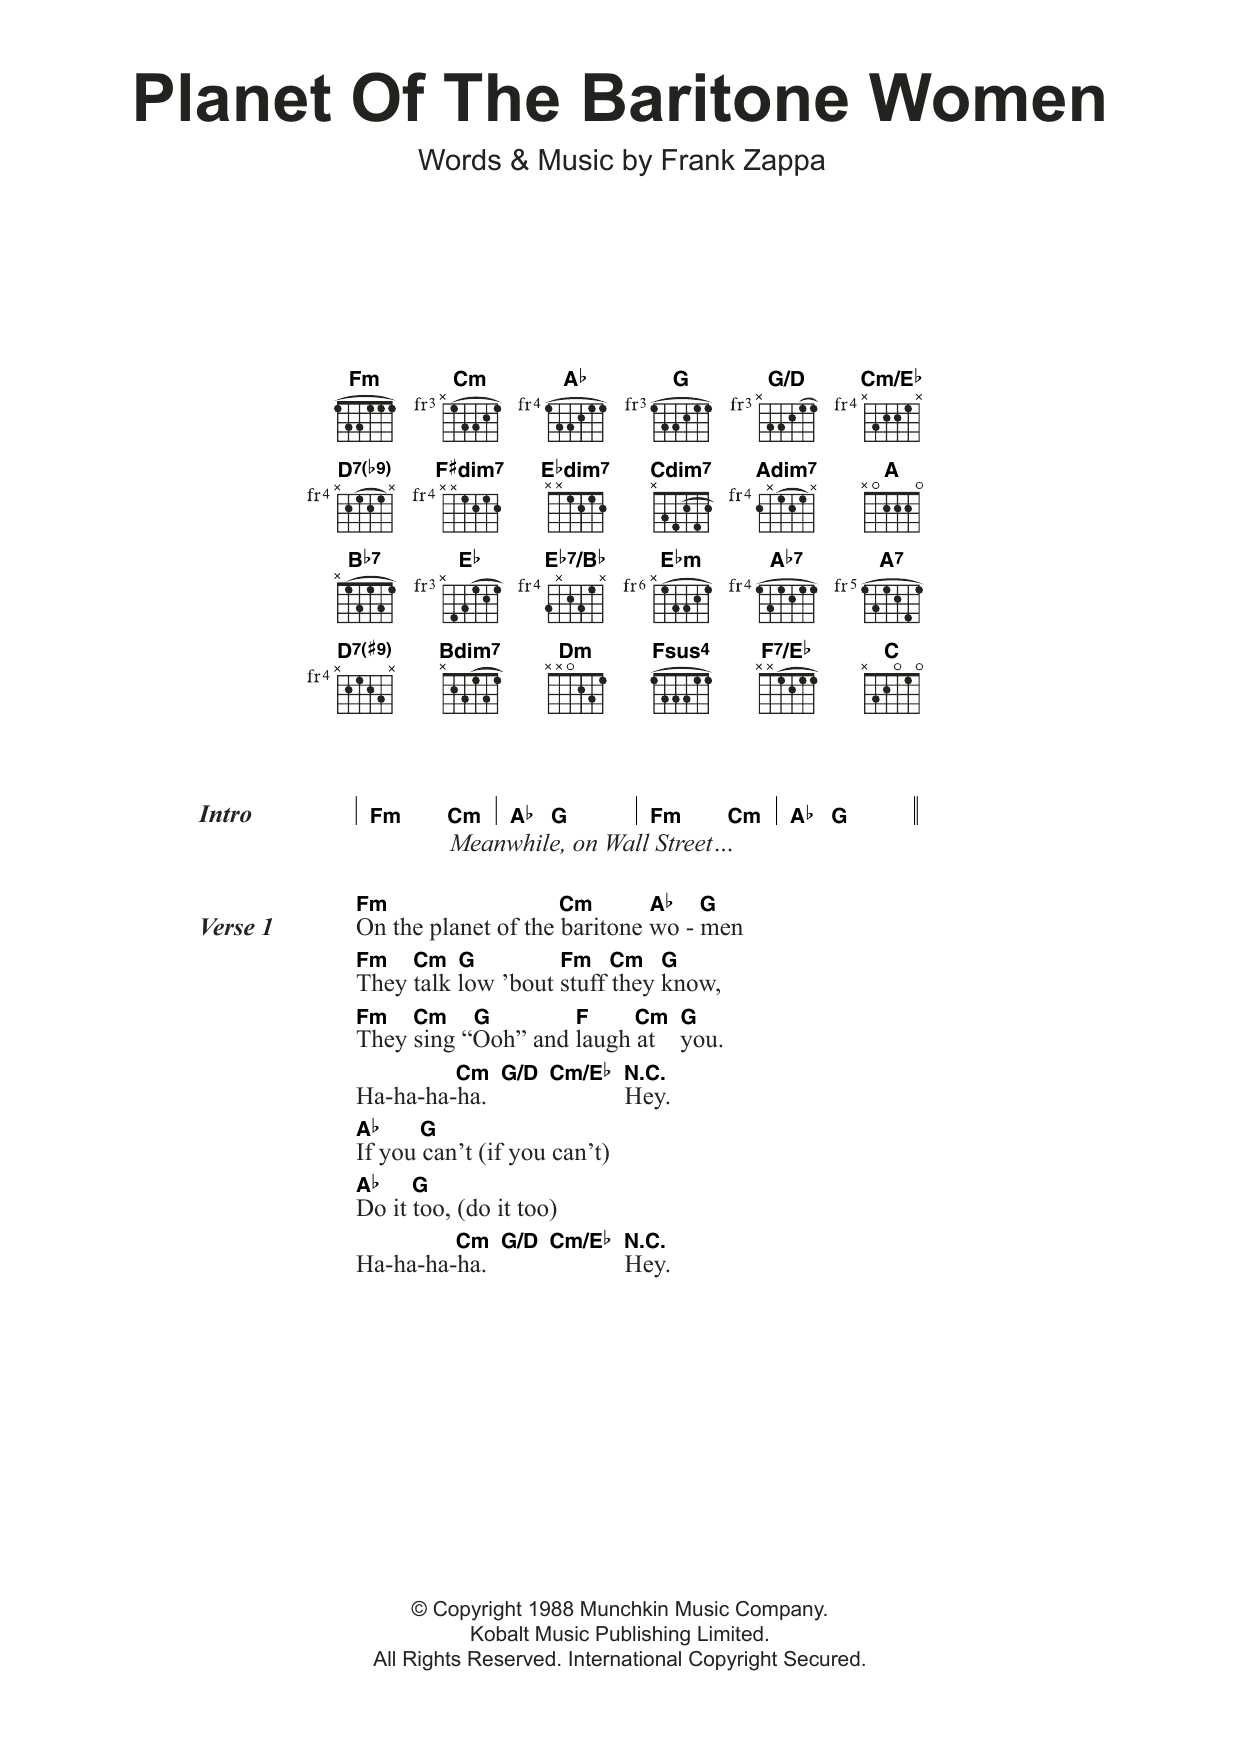 Planet Of The Baritone Women Sheet Music